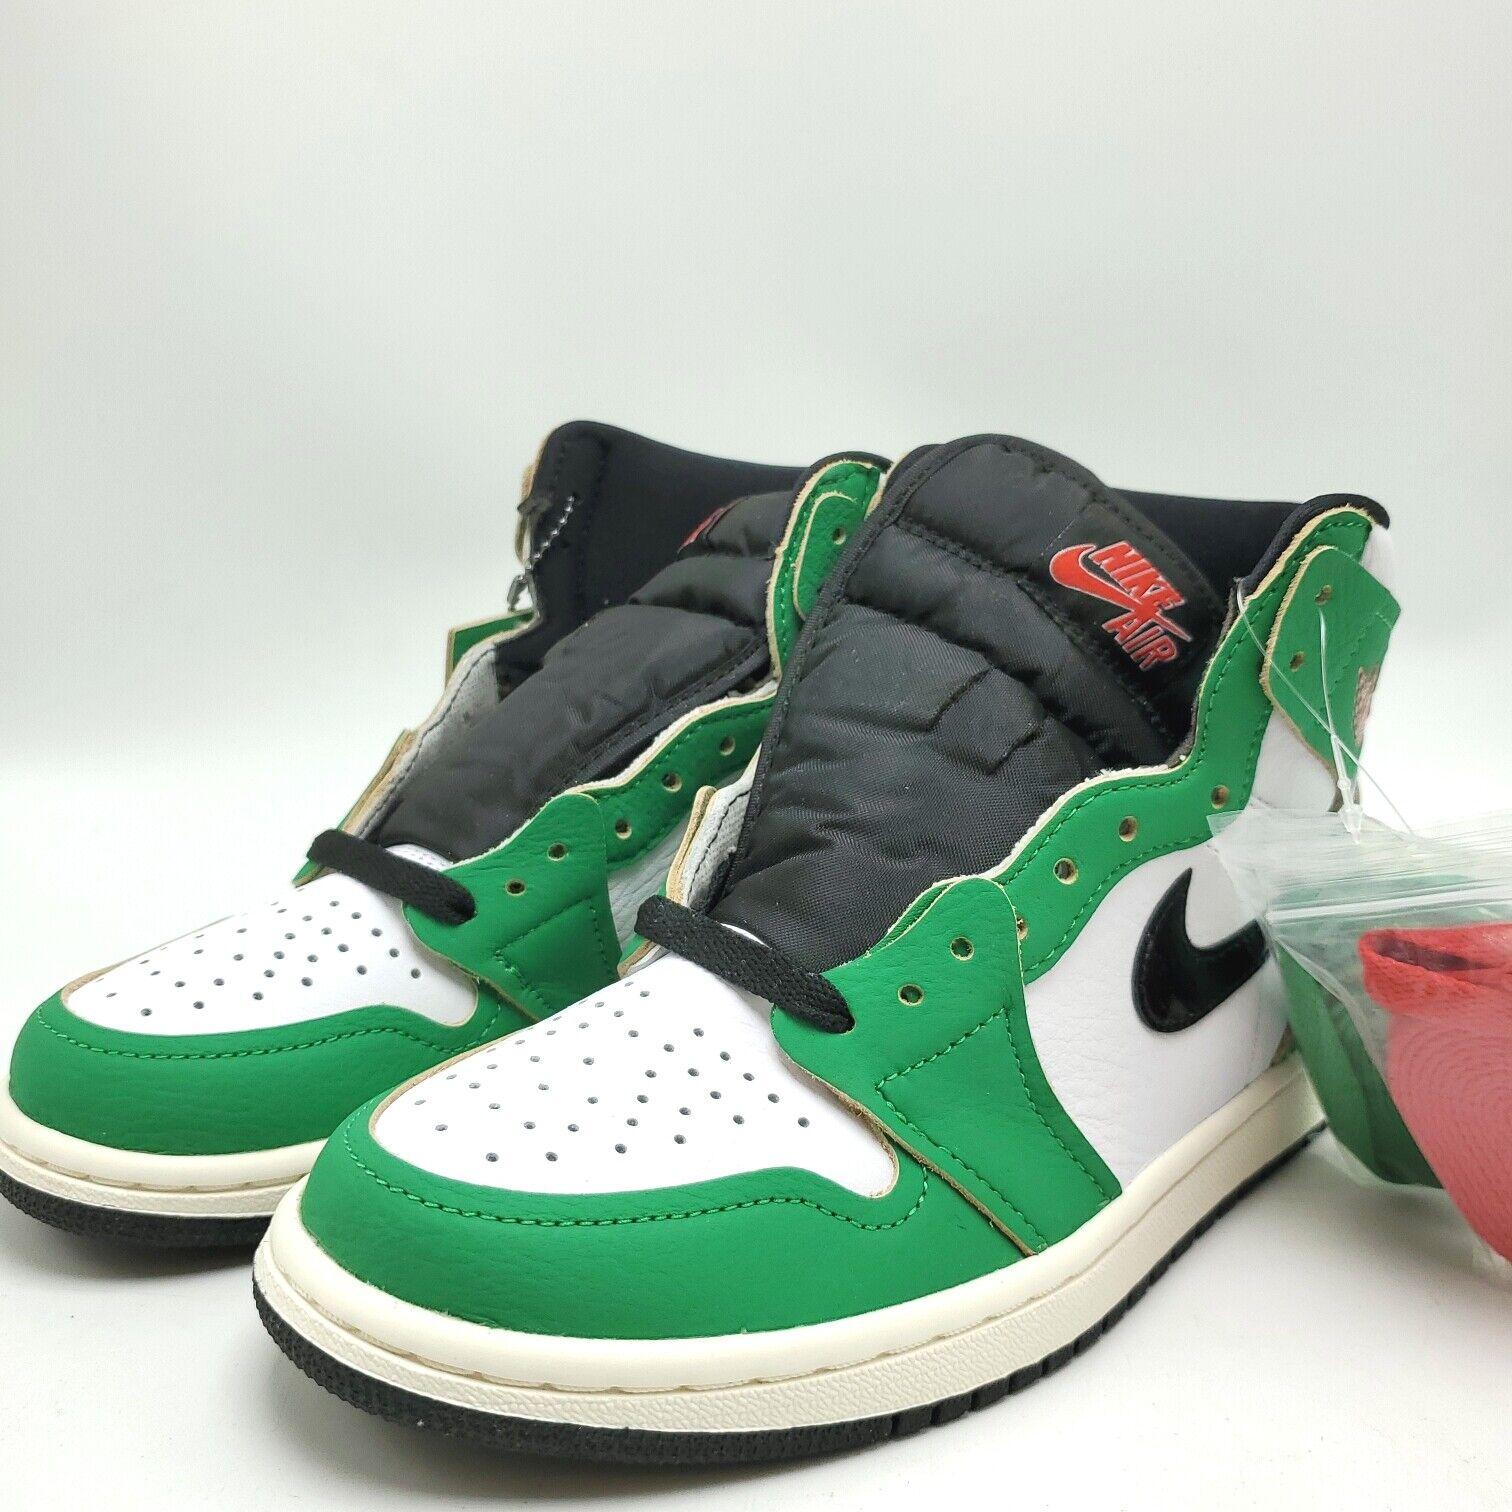 Nike Juvenate Women's Shoes Size 9